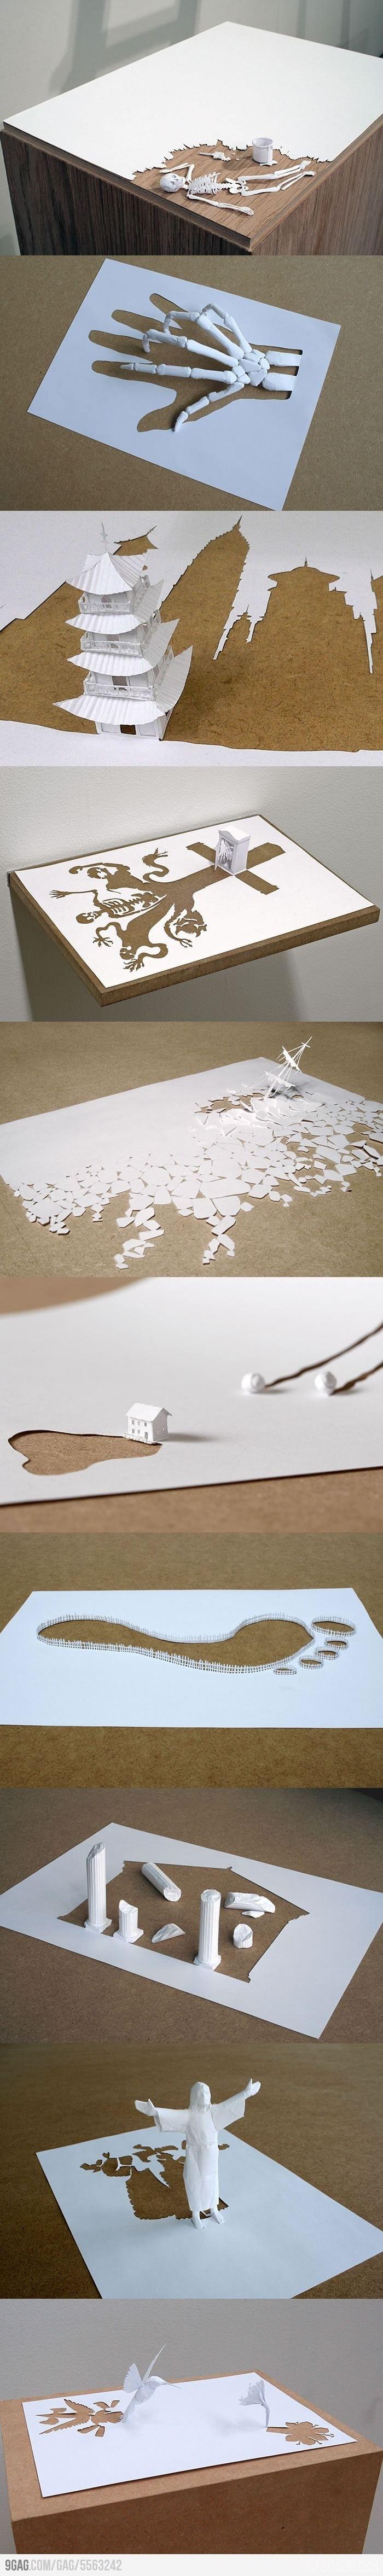 Mother of Paper Art